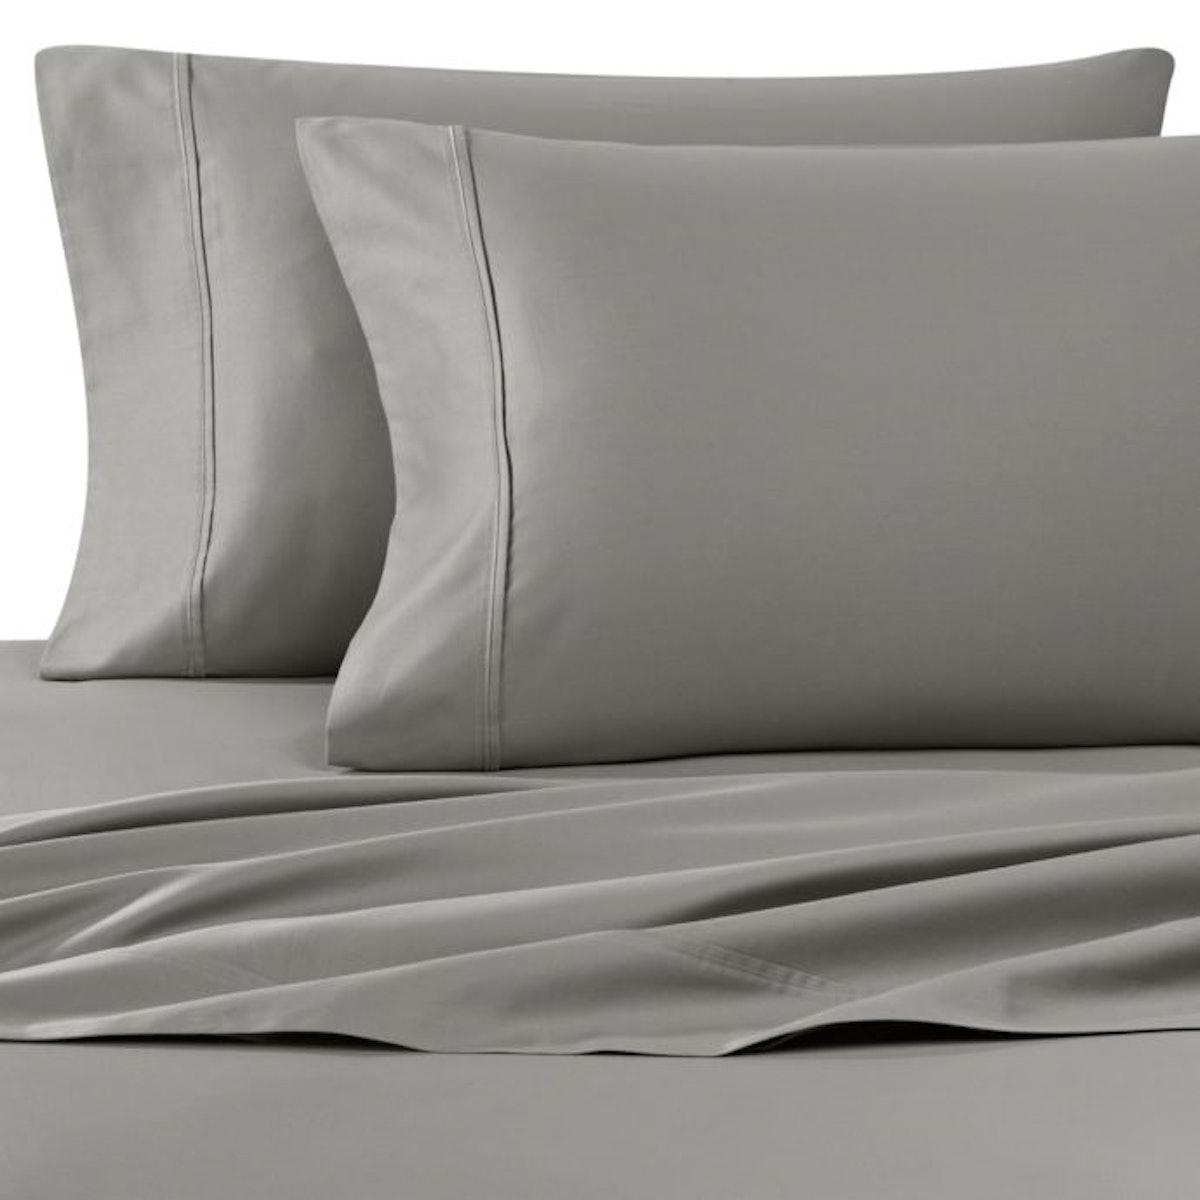 Wamsutta® 400-Thread-Count Sateen Queen Sheet Set in Grey